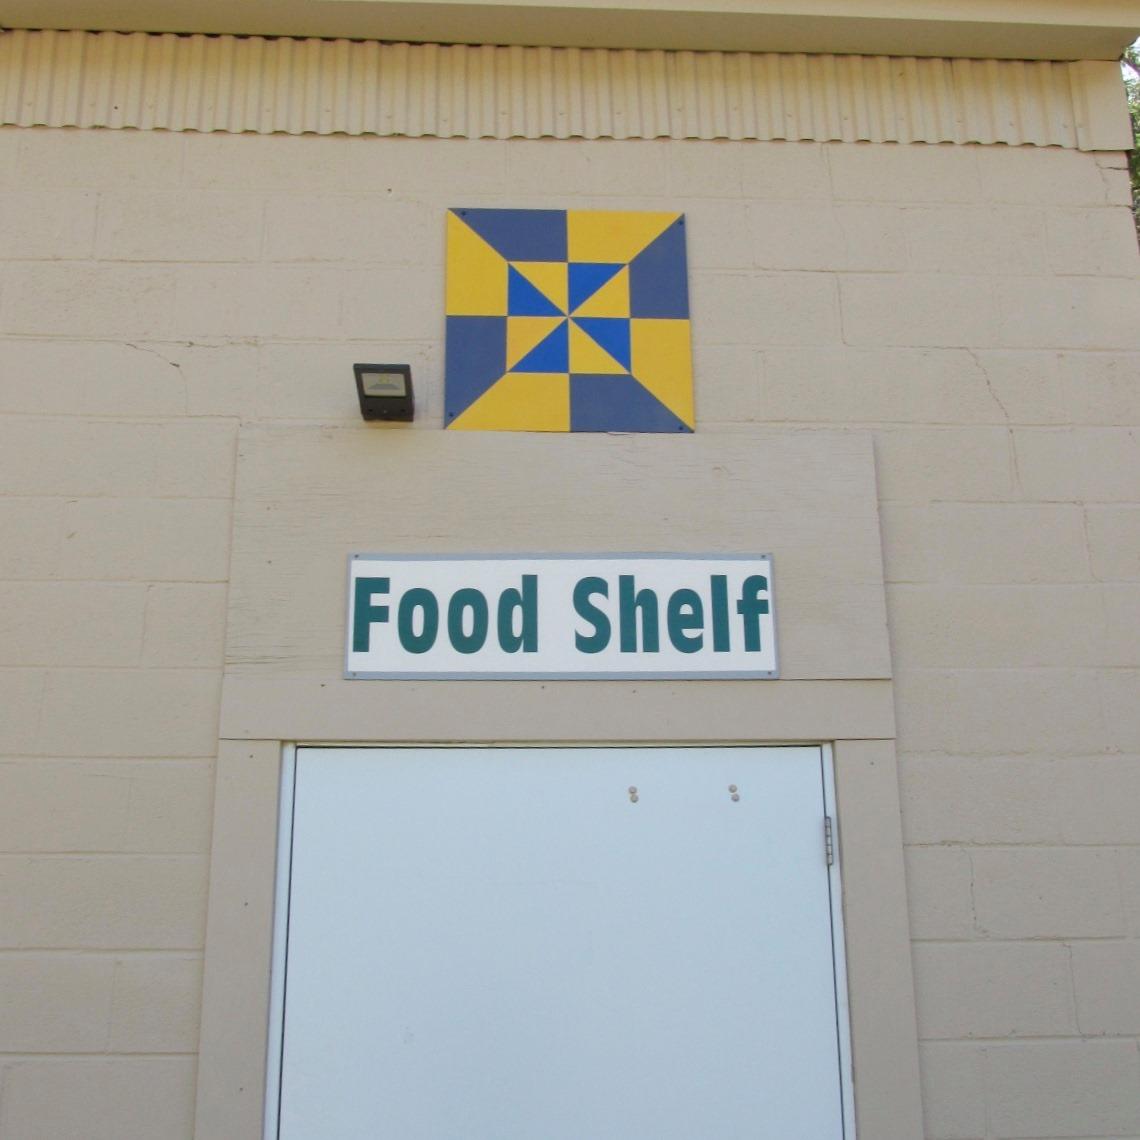 Staples Area Food Shelf